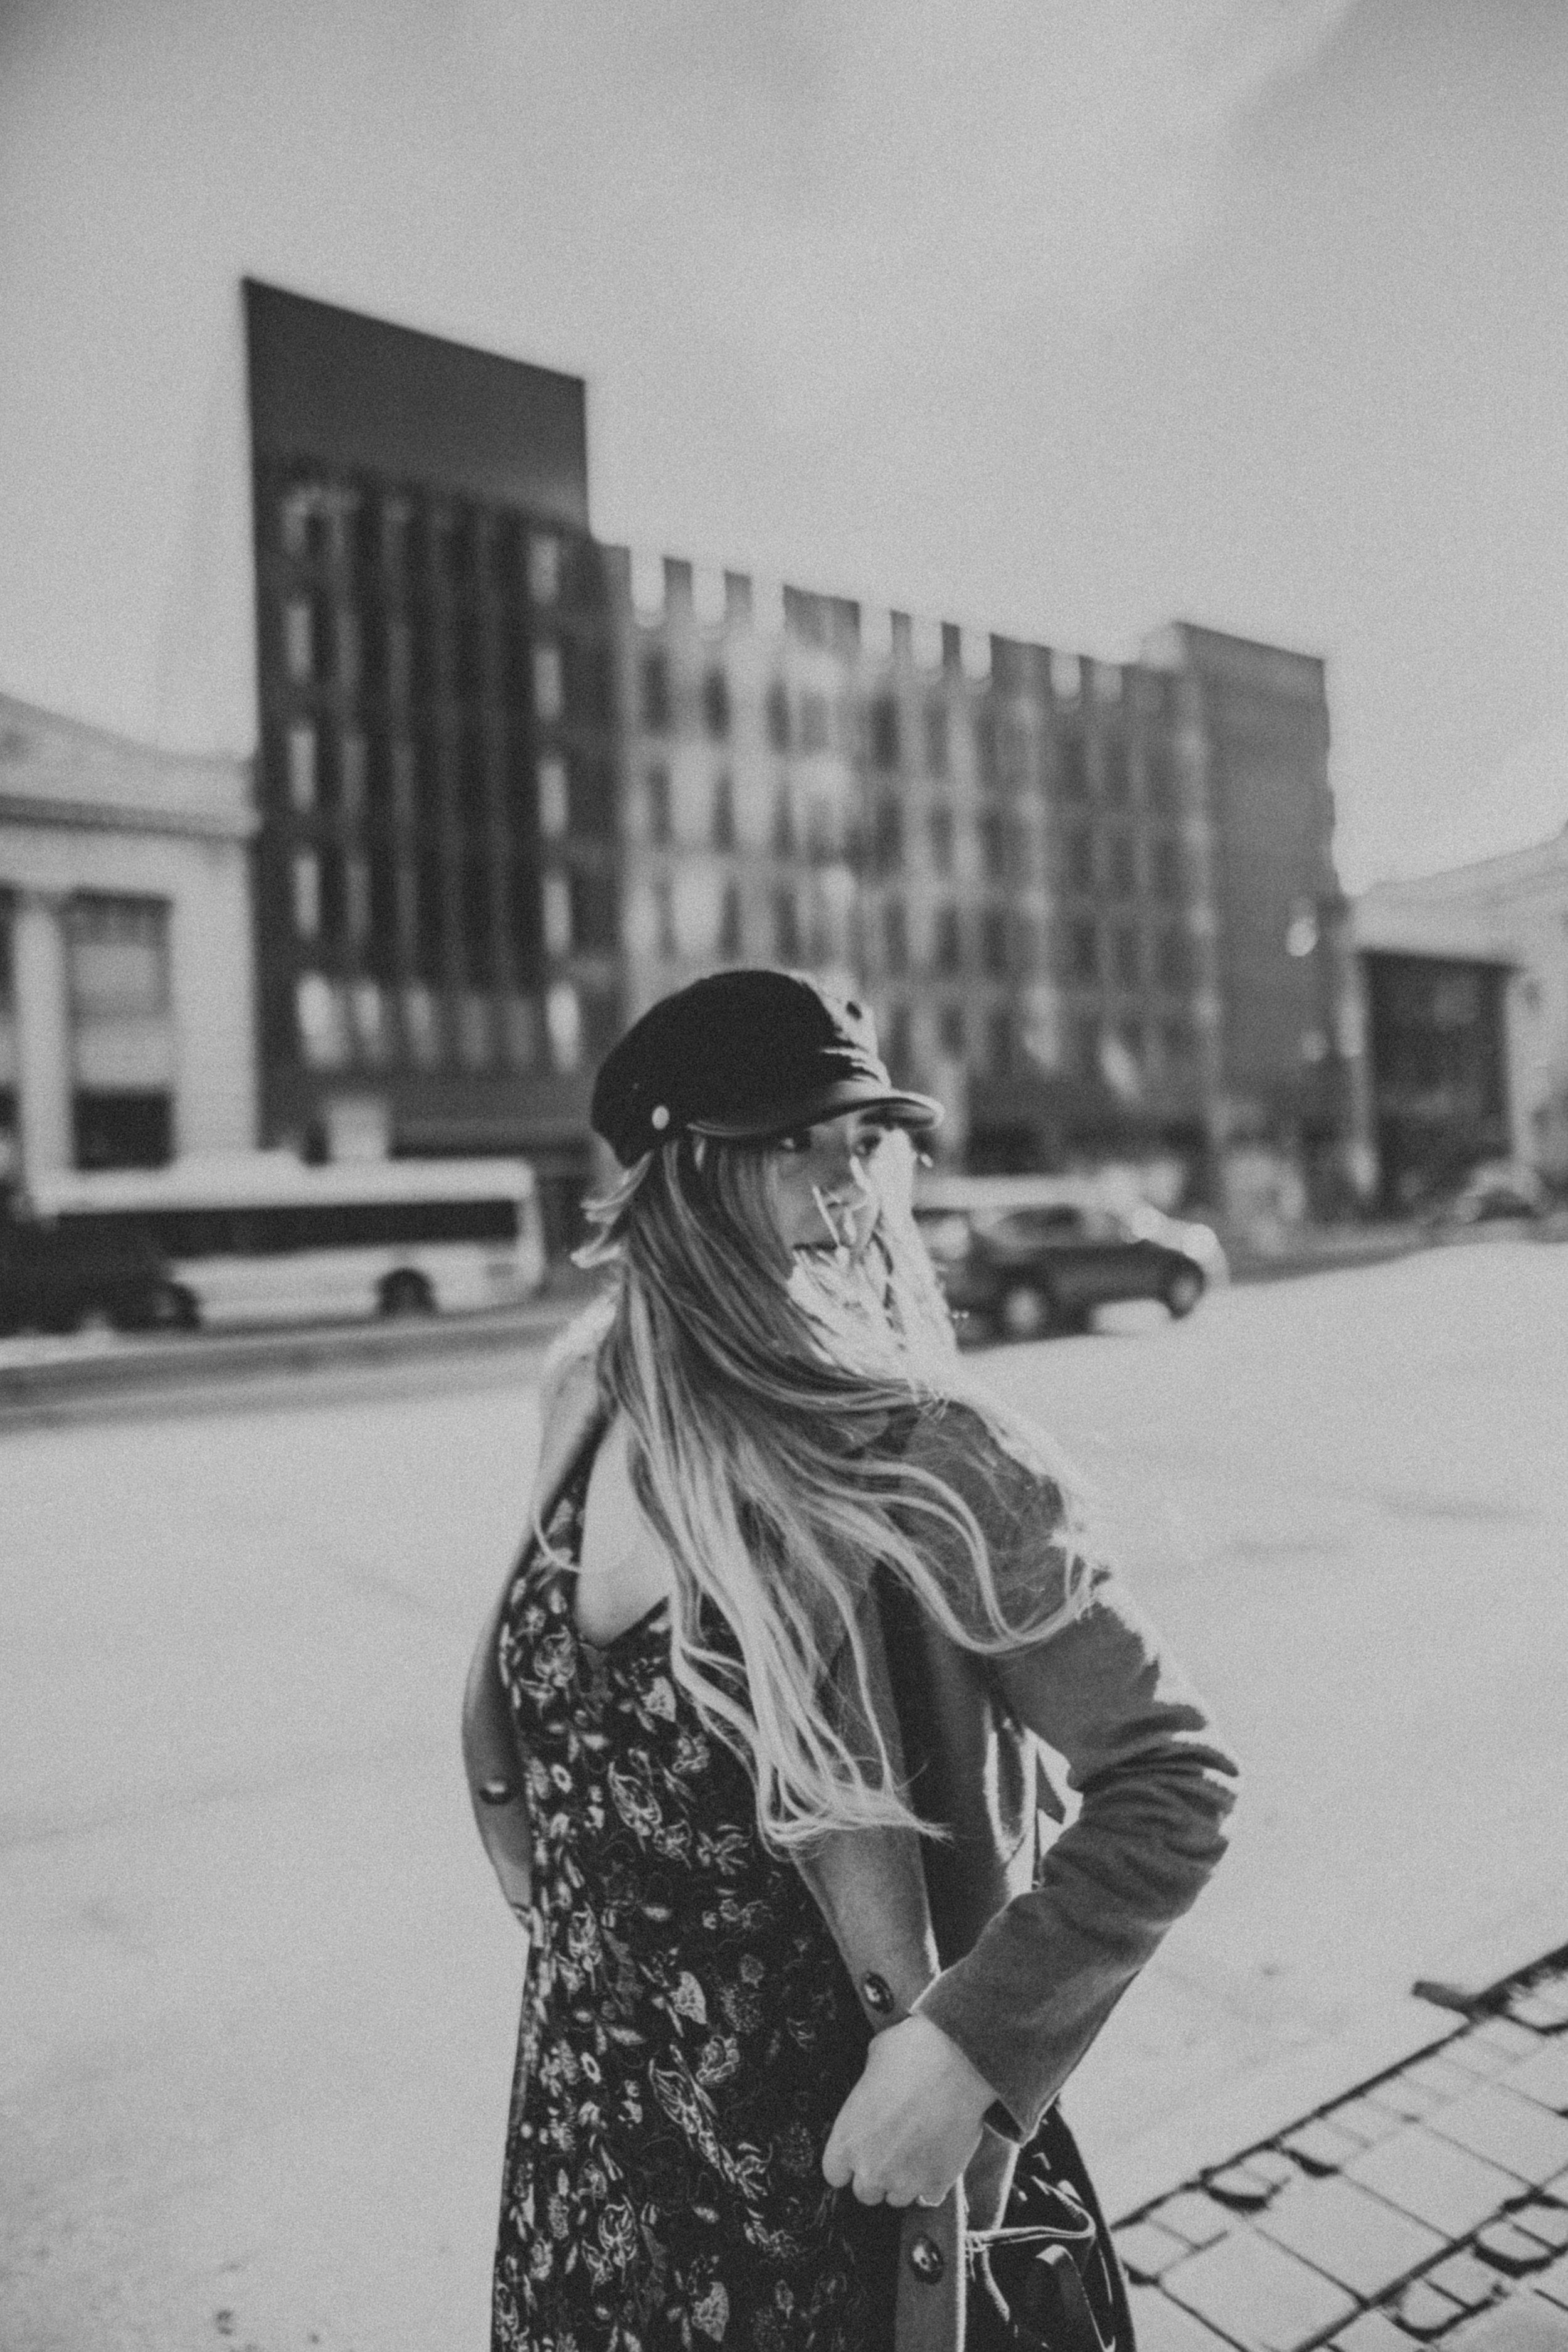 Winnipeg_AllegraRoseCreative_October_2017_155.jpg